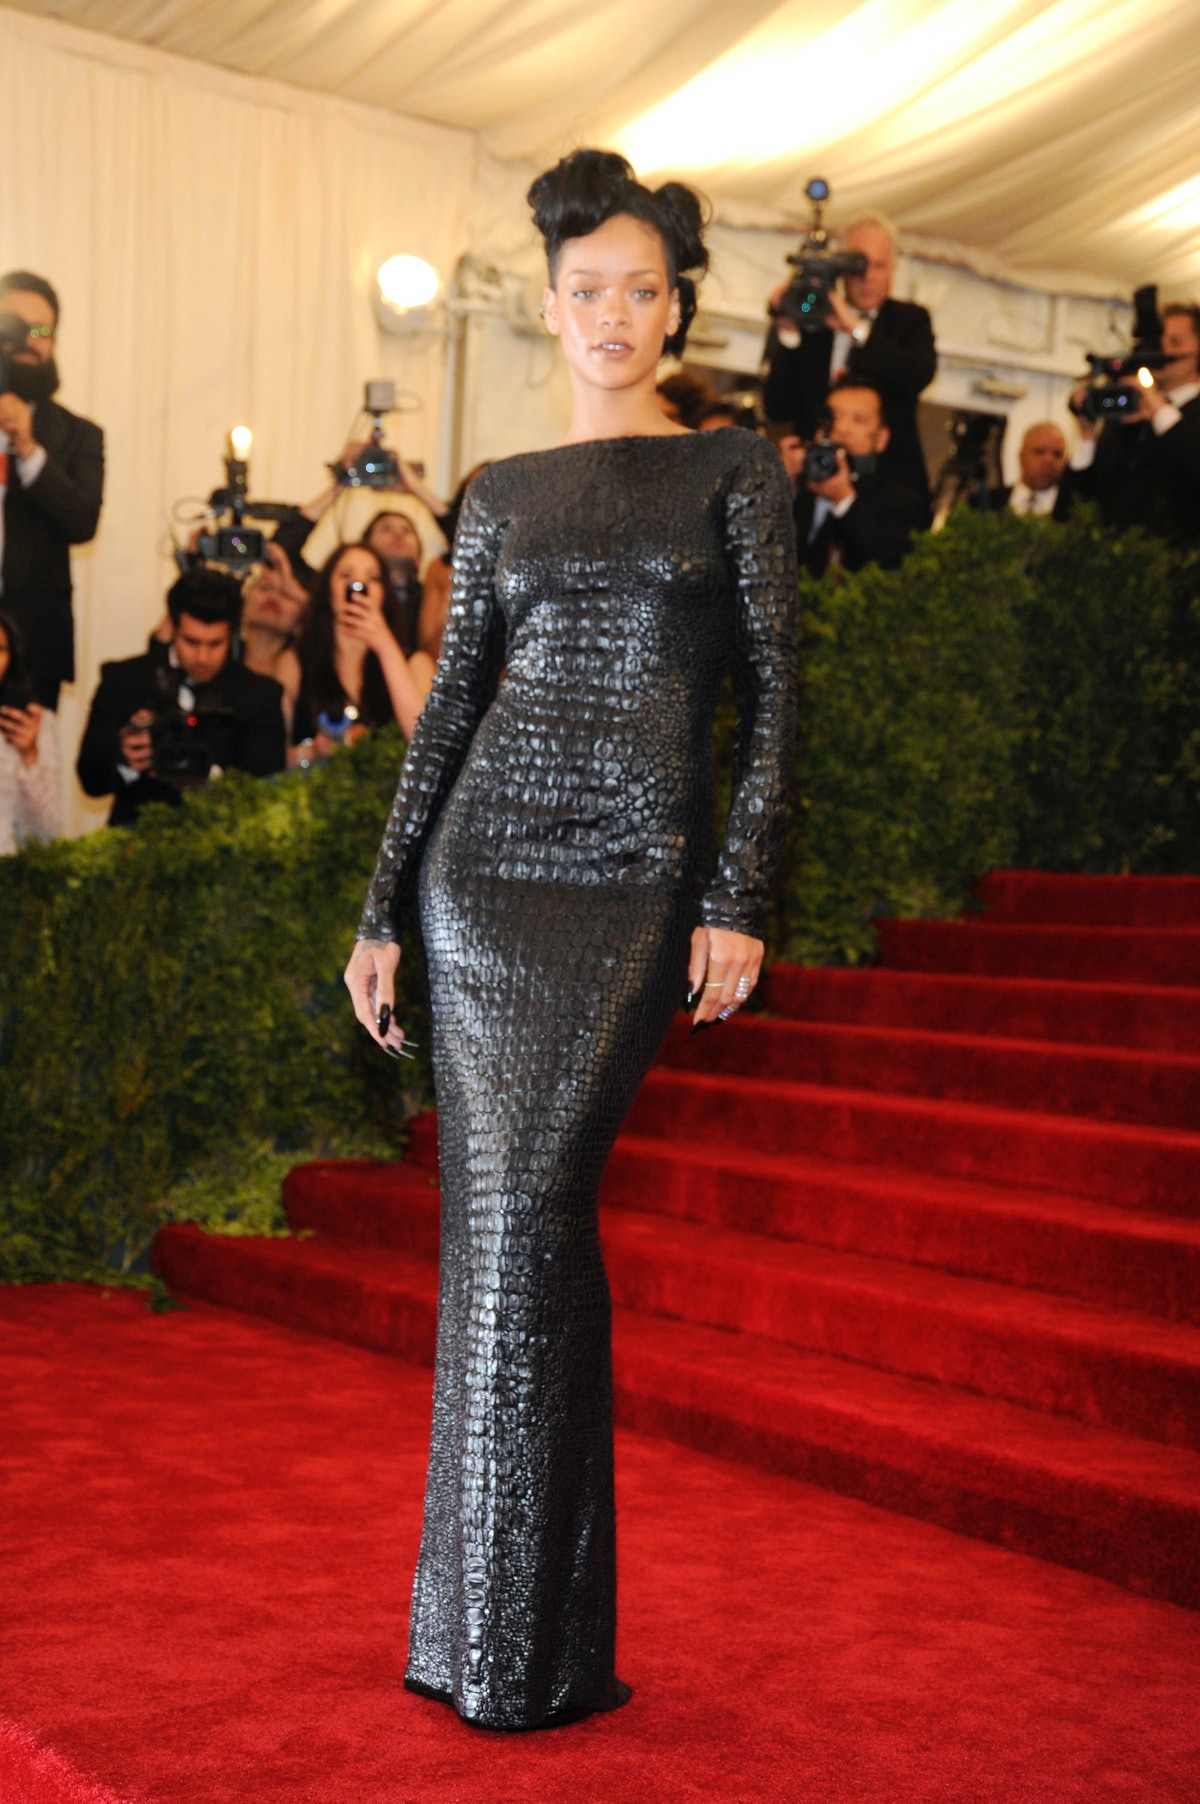 Rihanna in leather dress